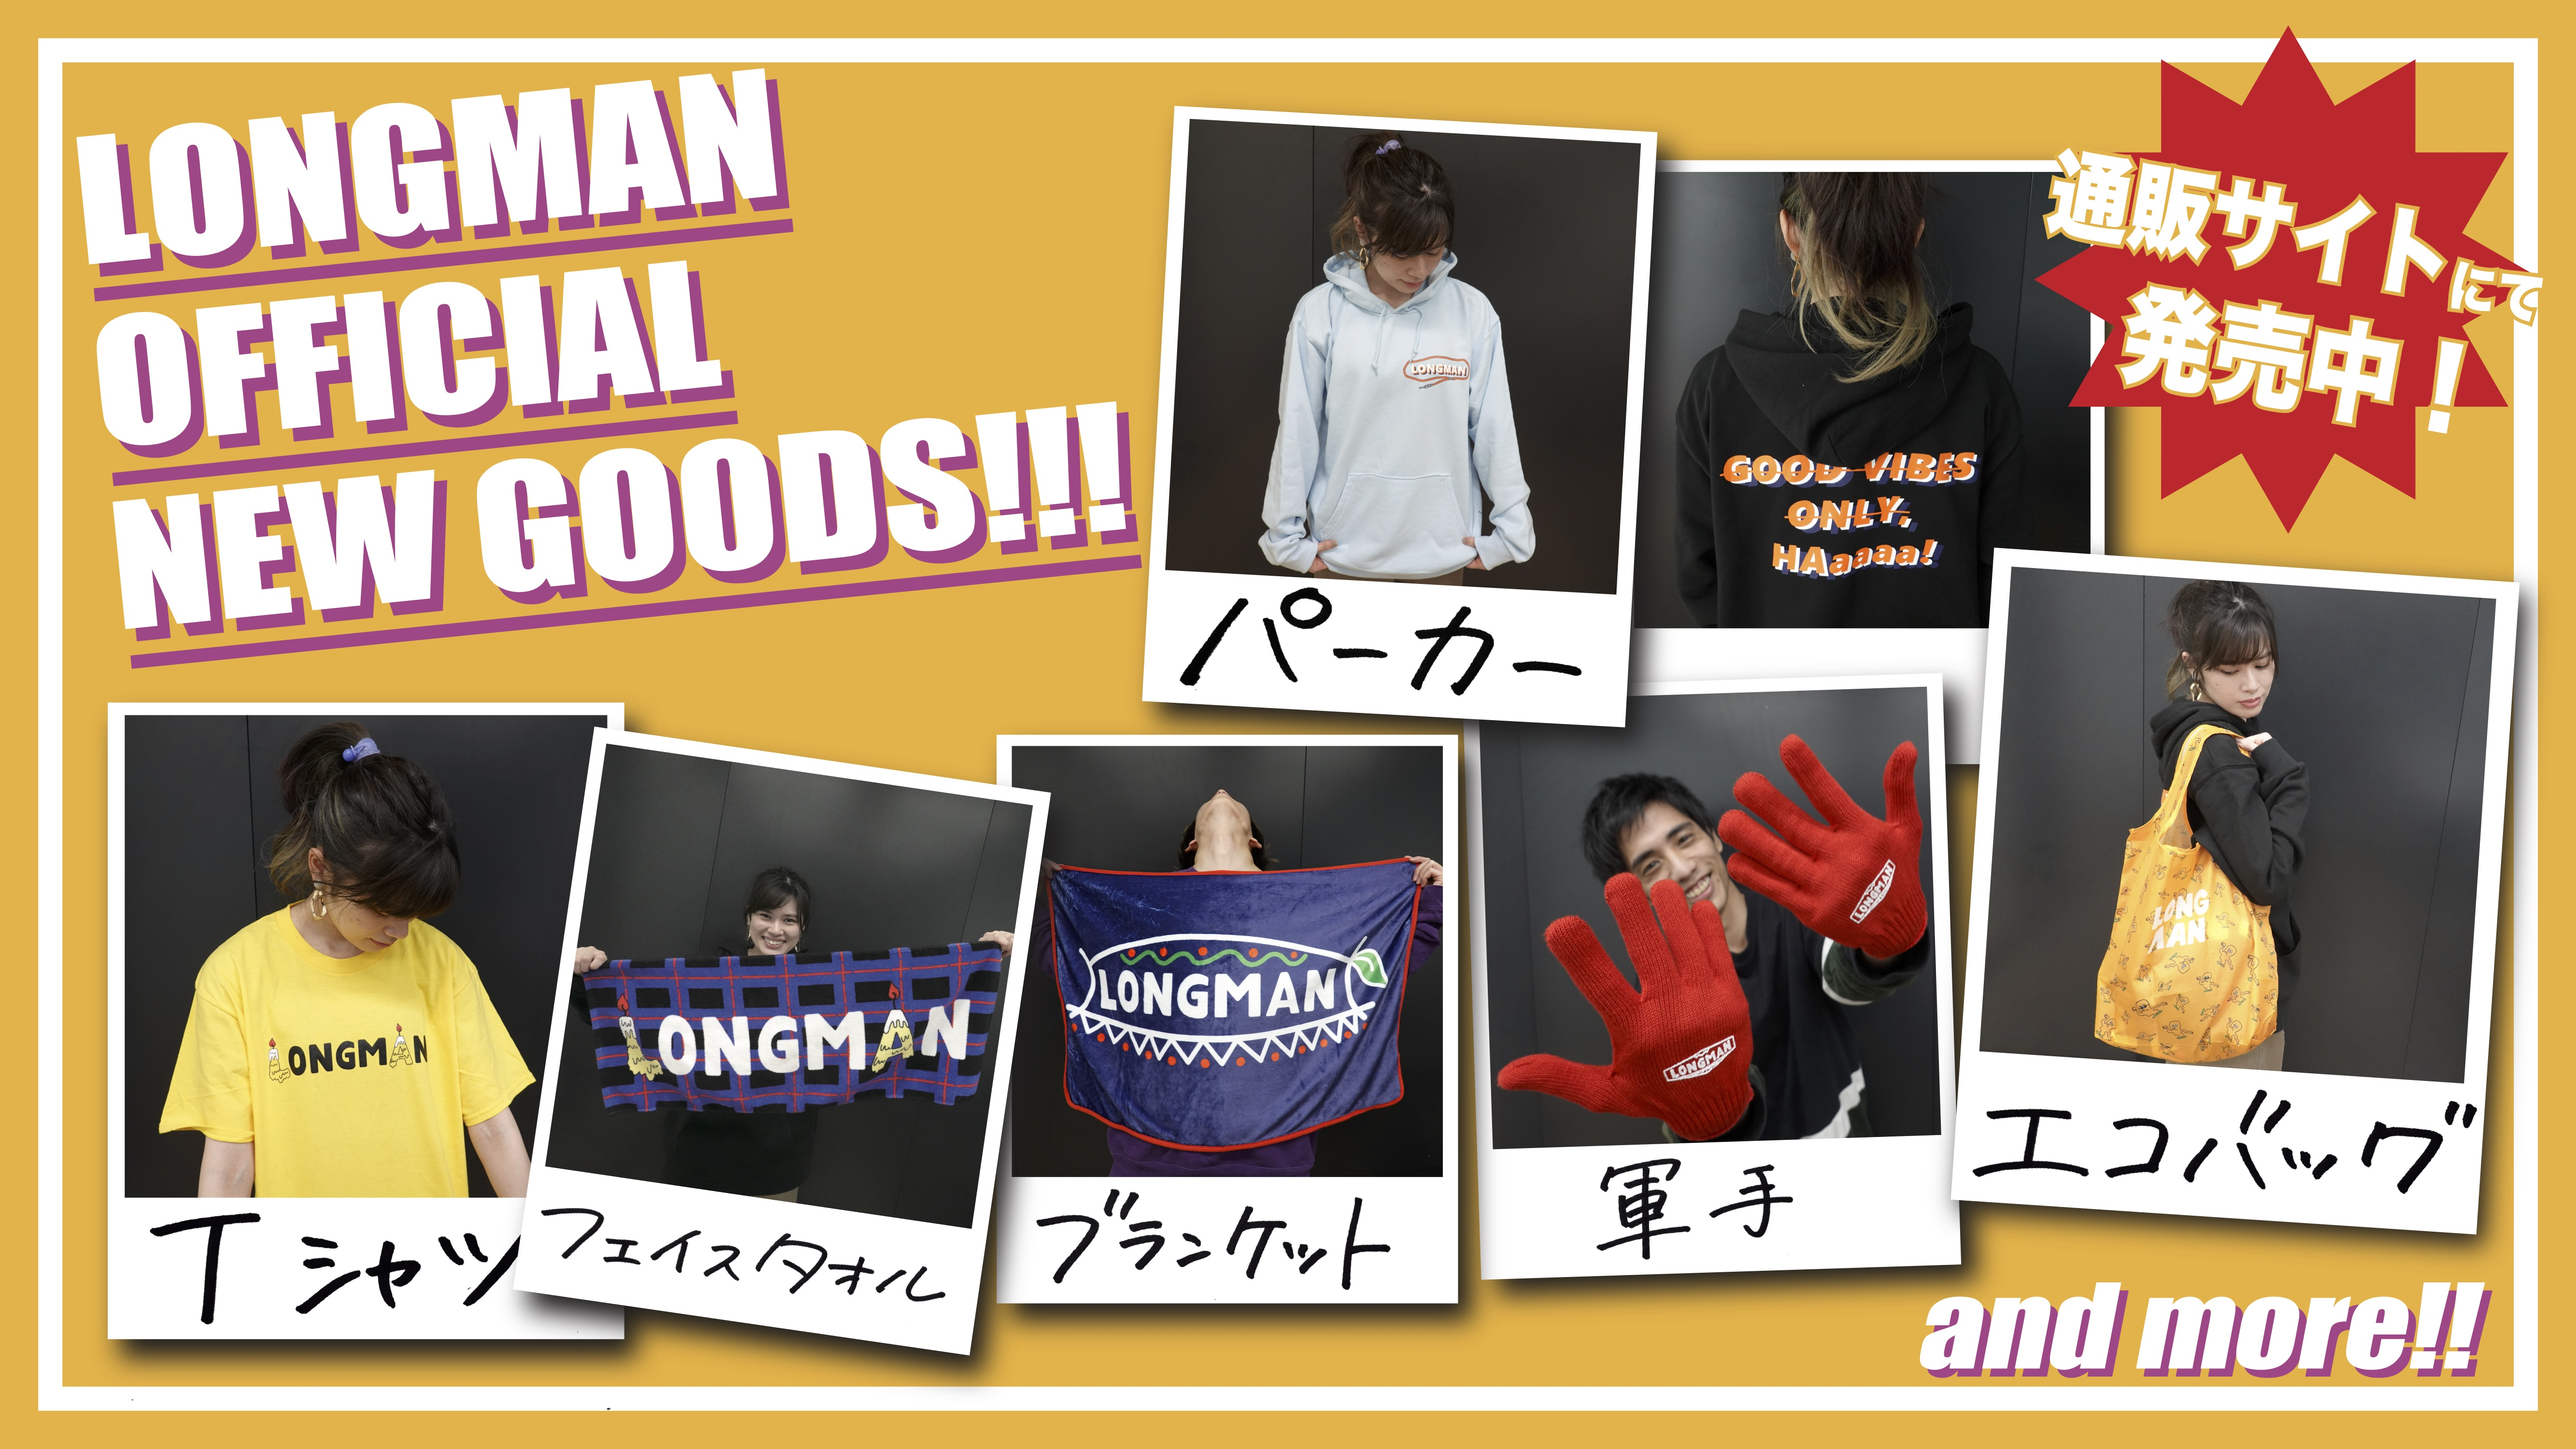 LONGMAN  OFFICIAL NEW GOODS 通販サイトにて販売中!